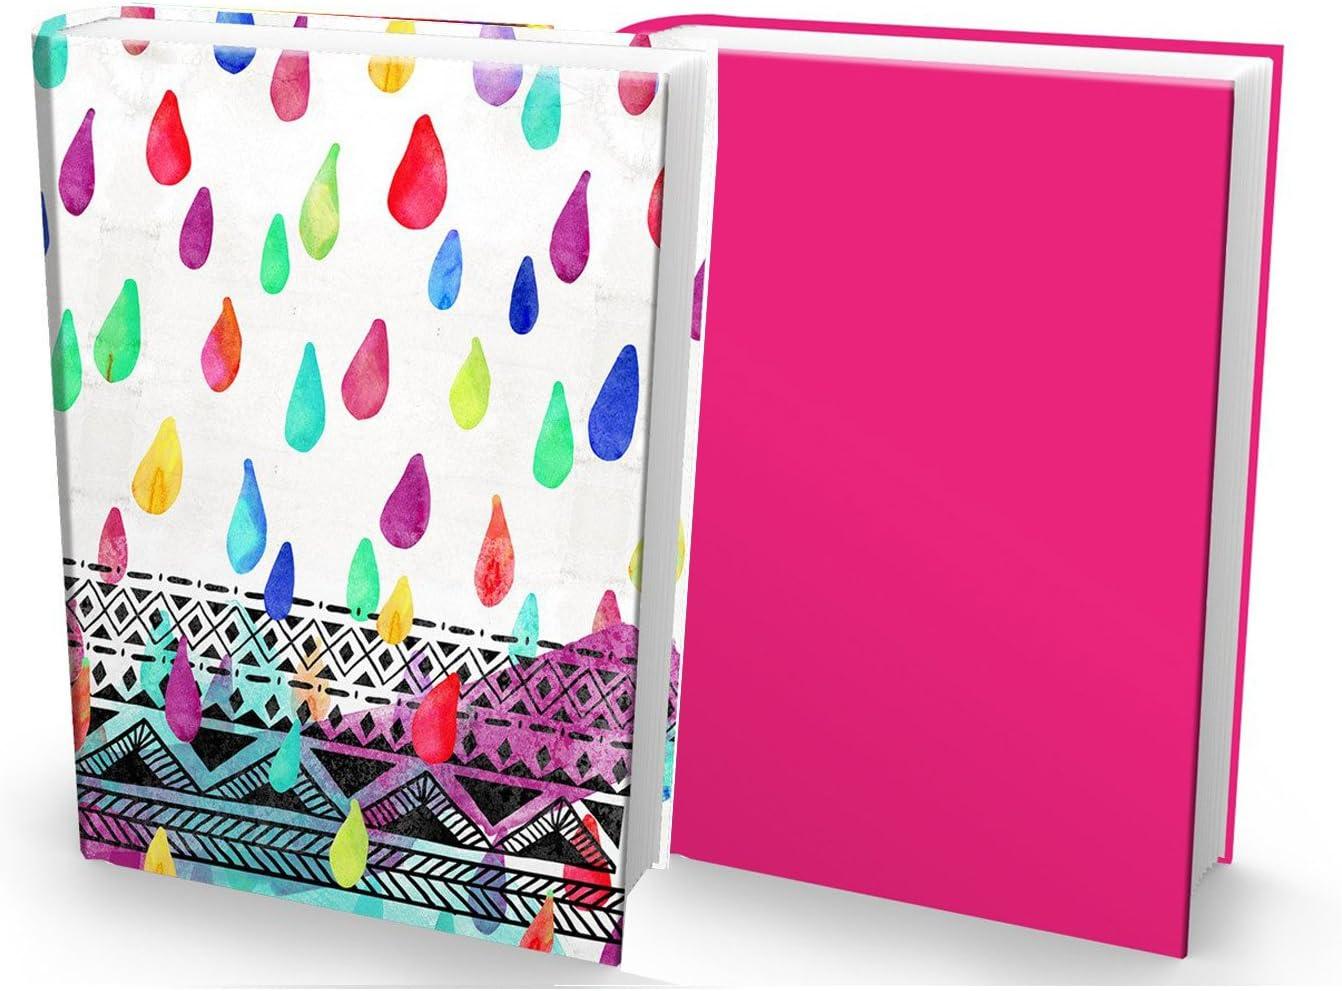 2 Items Watercolor Rain Drops Print and Magenta Solid Book Sox Fabric Jumbo Book Covers